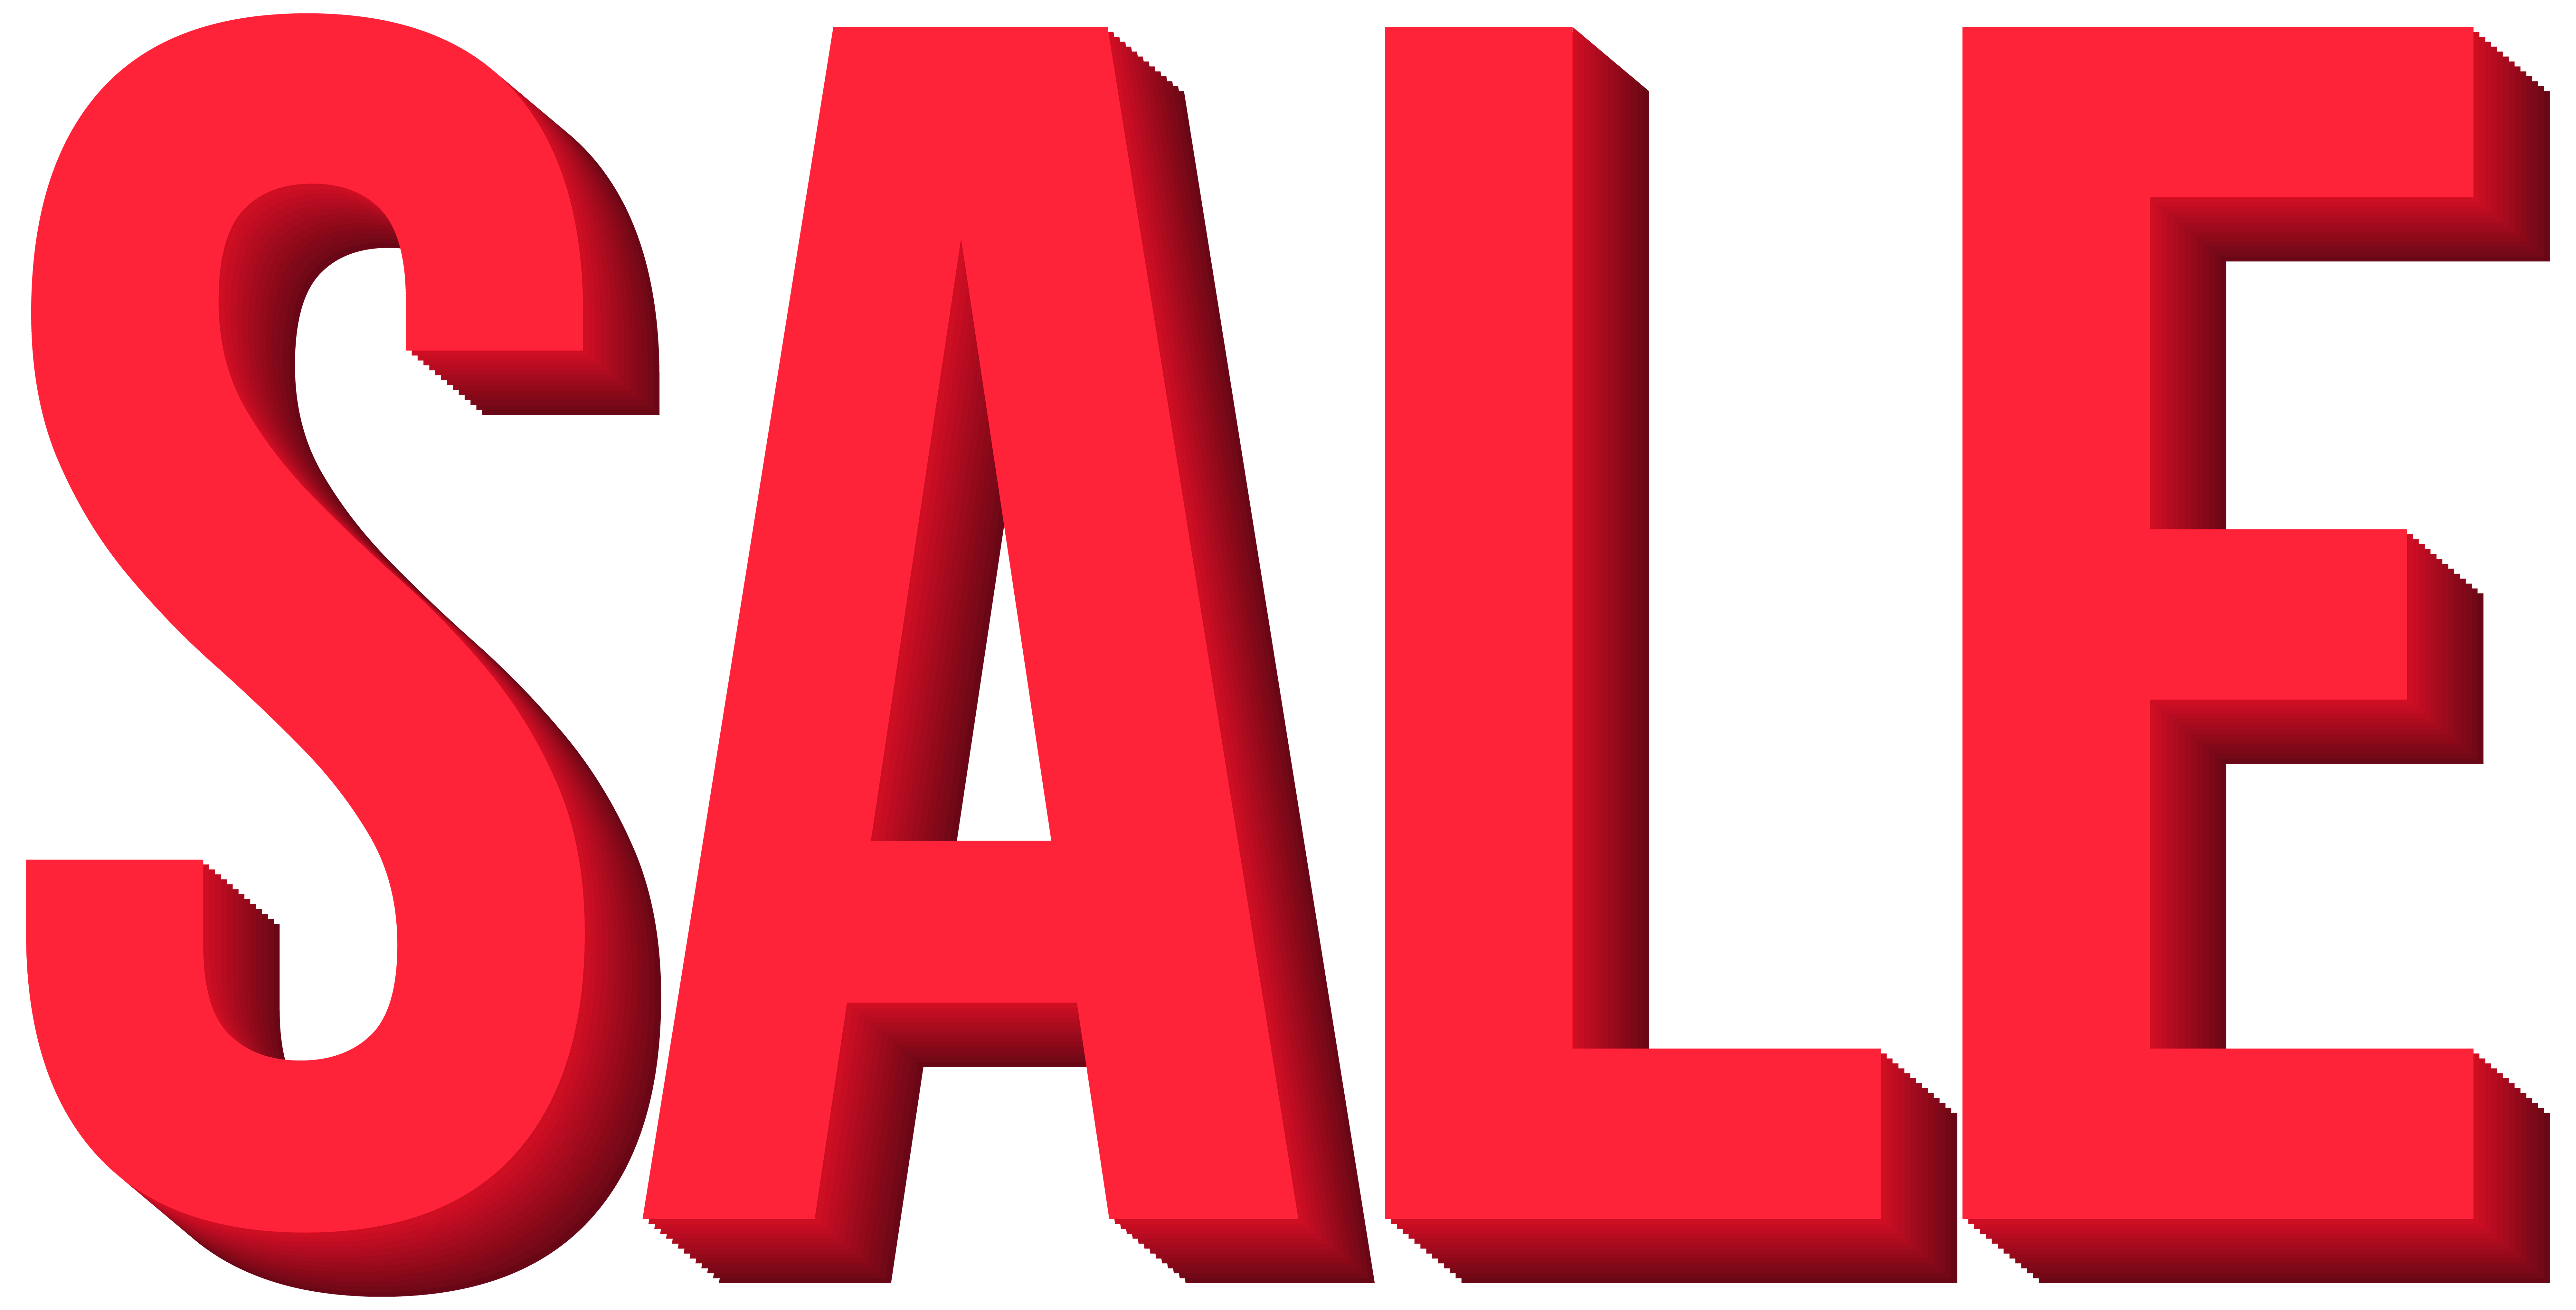 Red Sale Transparent PNG Clip Art Image.